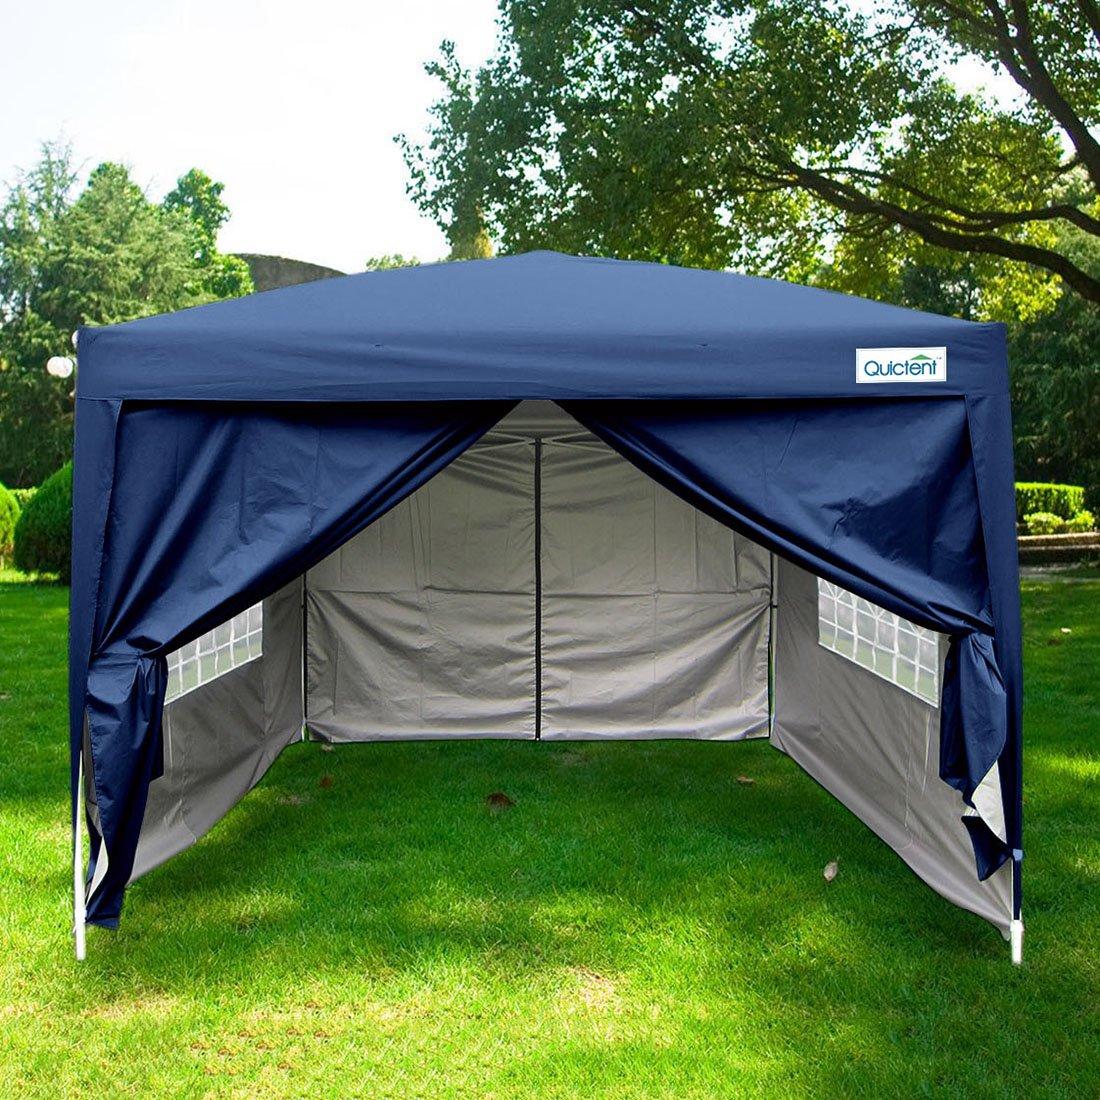 Peaktop10x10 Navy Blue EZ Pop Up Party Tent Canopy Gazeb Navy Blue 4 Walls 100% Waterproof